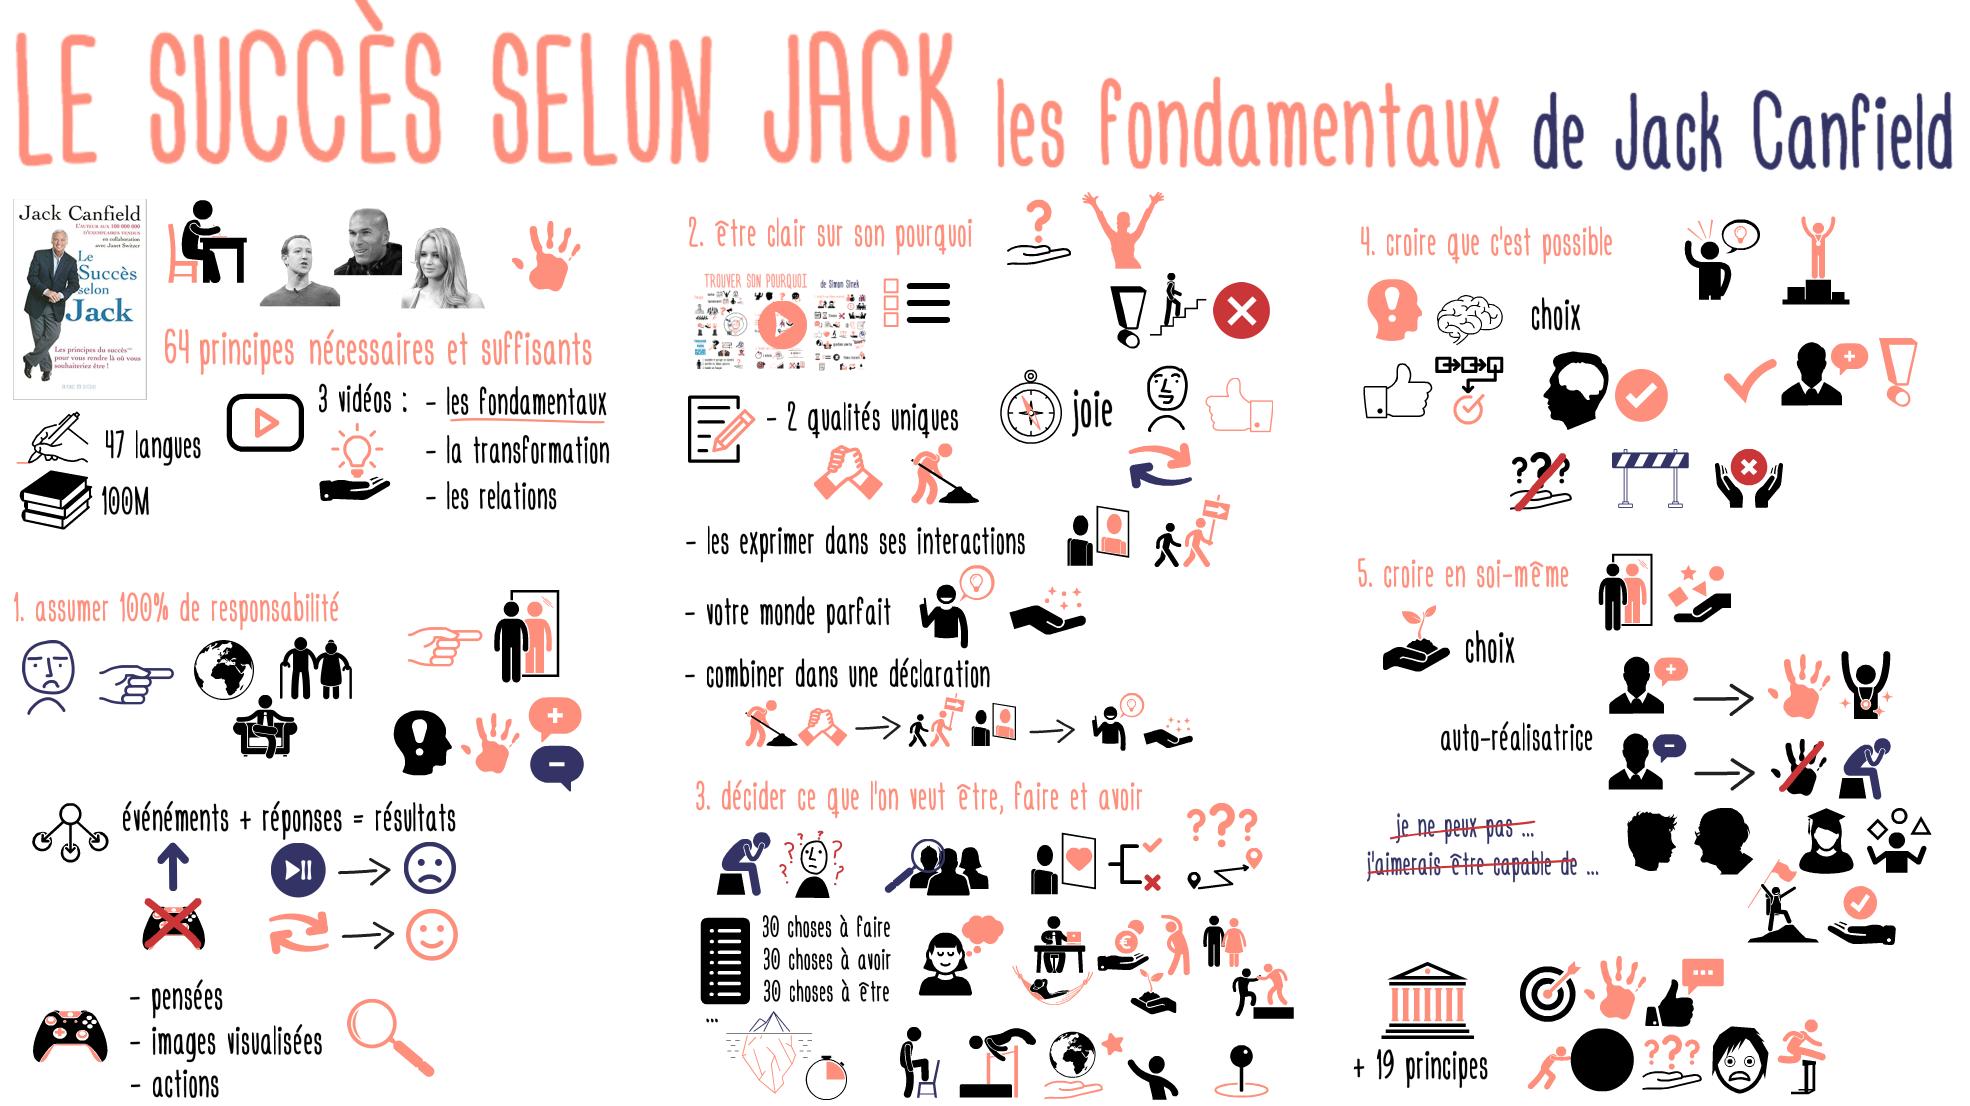 177 Succes selon Jack fondamentaux